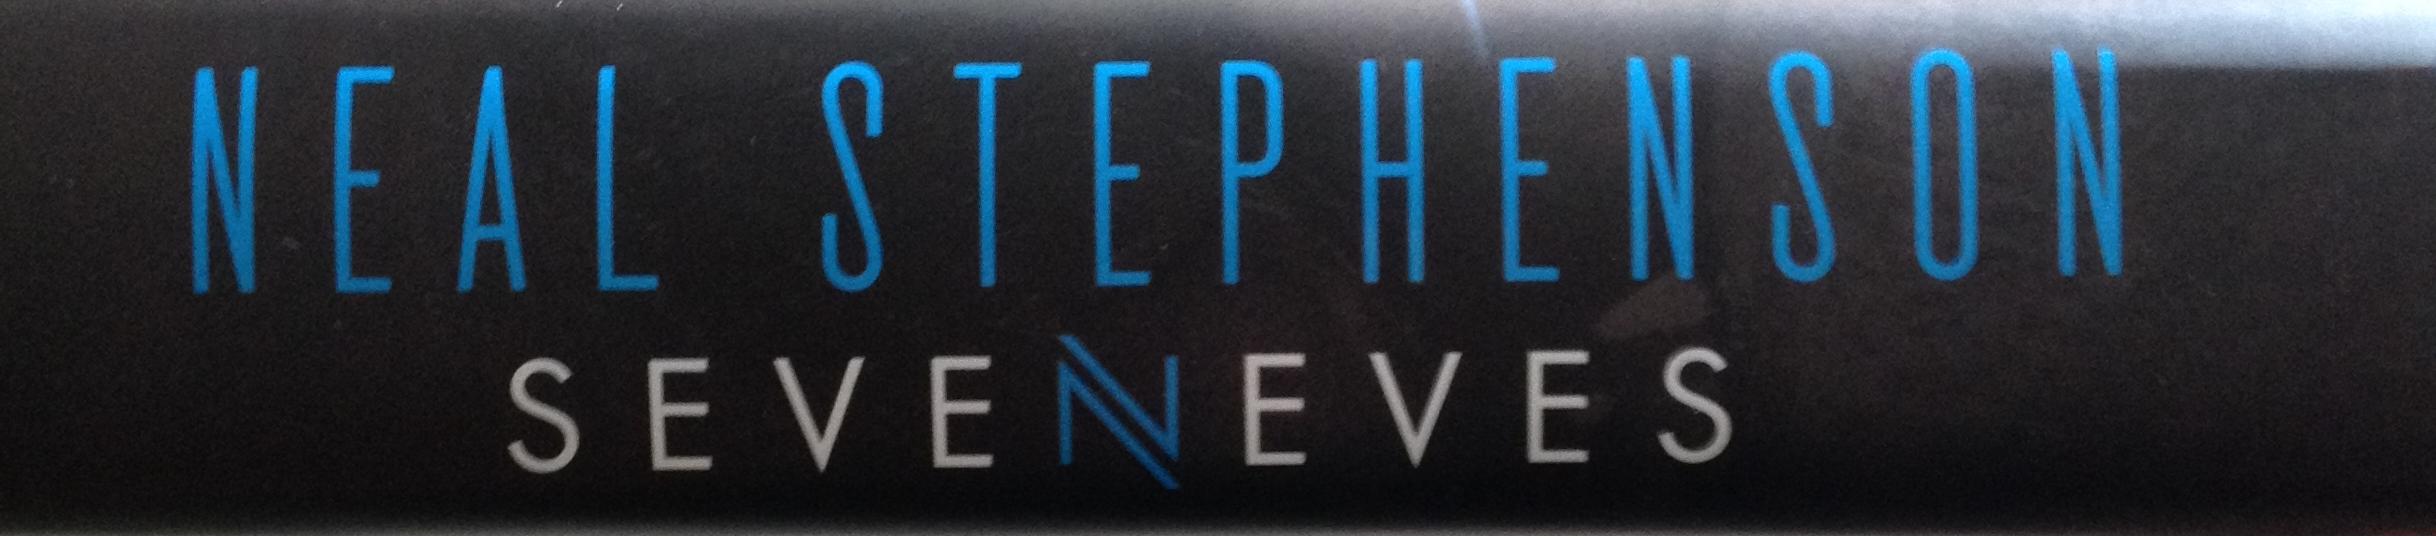 Seveneves 05 book spine